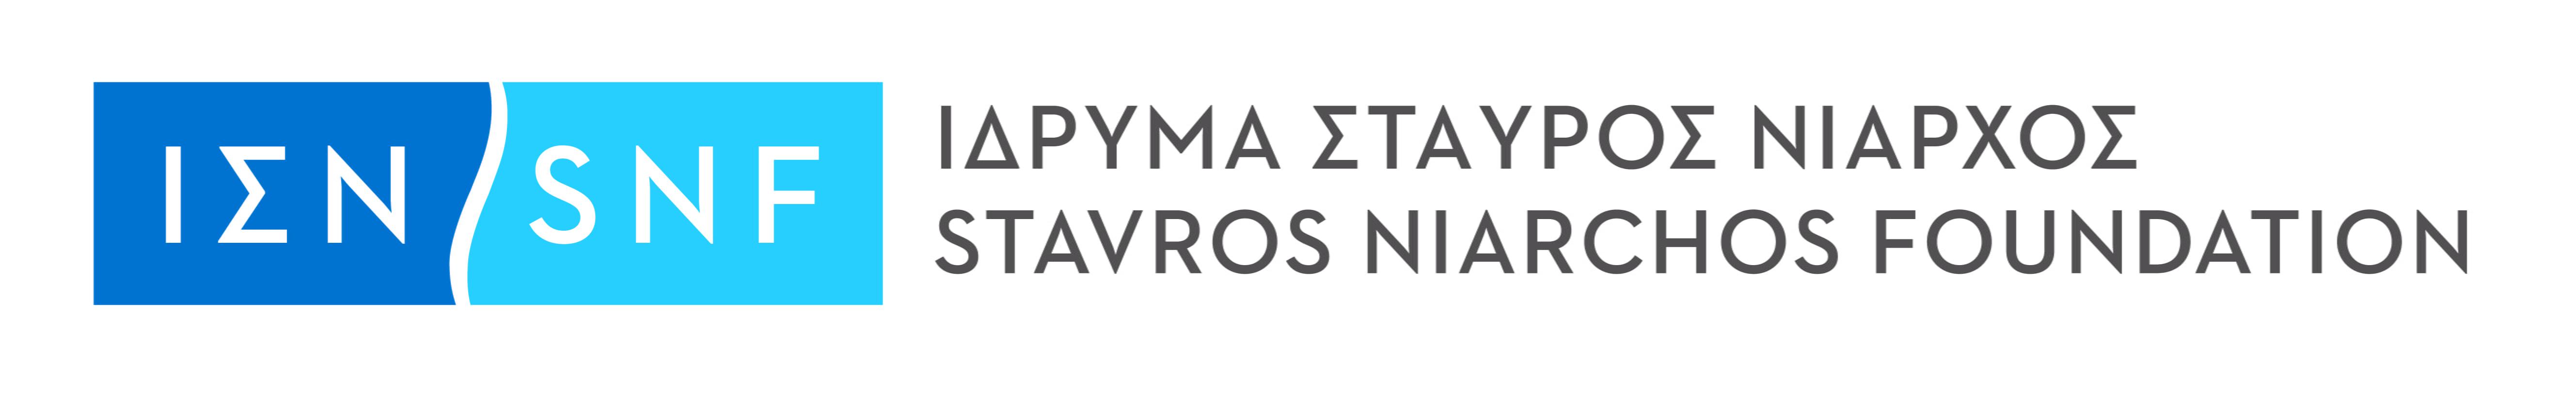 The Stavros Niarchos Foundation logo